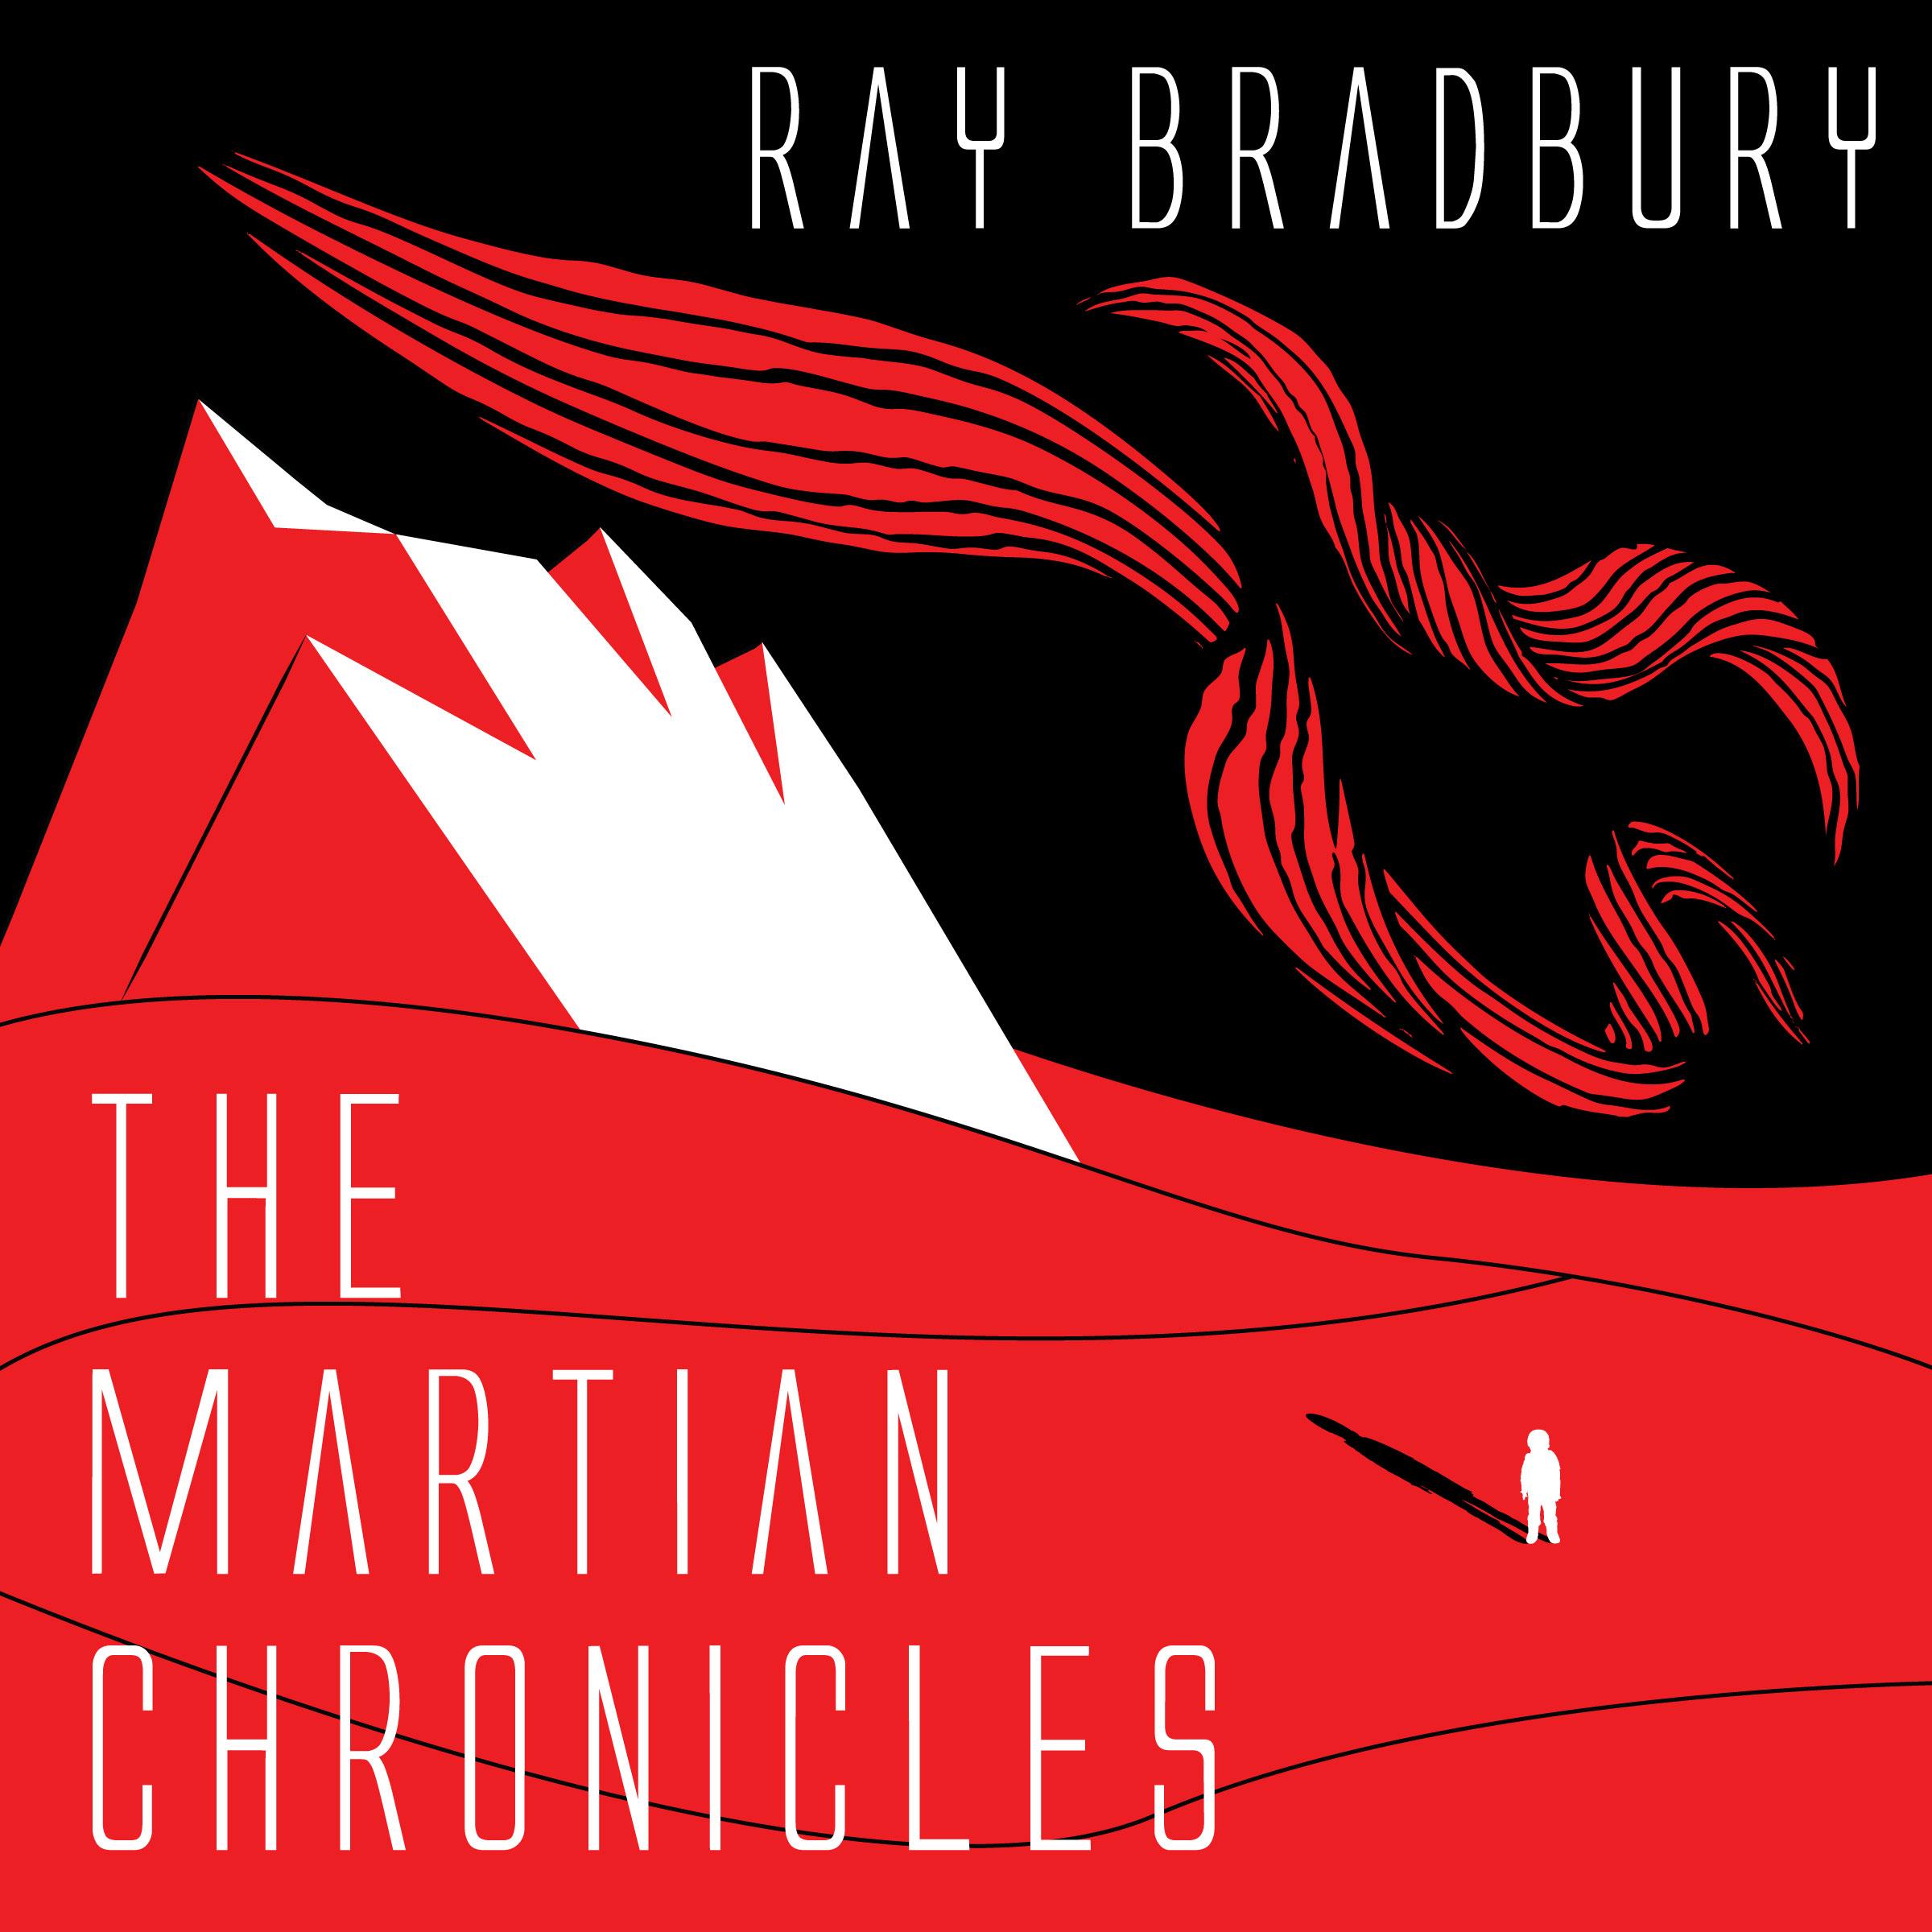 ADBLCRE-3712-Create-Covers-Ray-Bradbury-The-Martian-Chronicles-V2.jpg